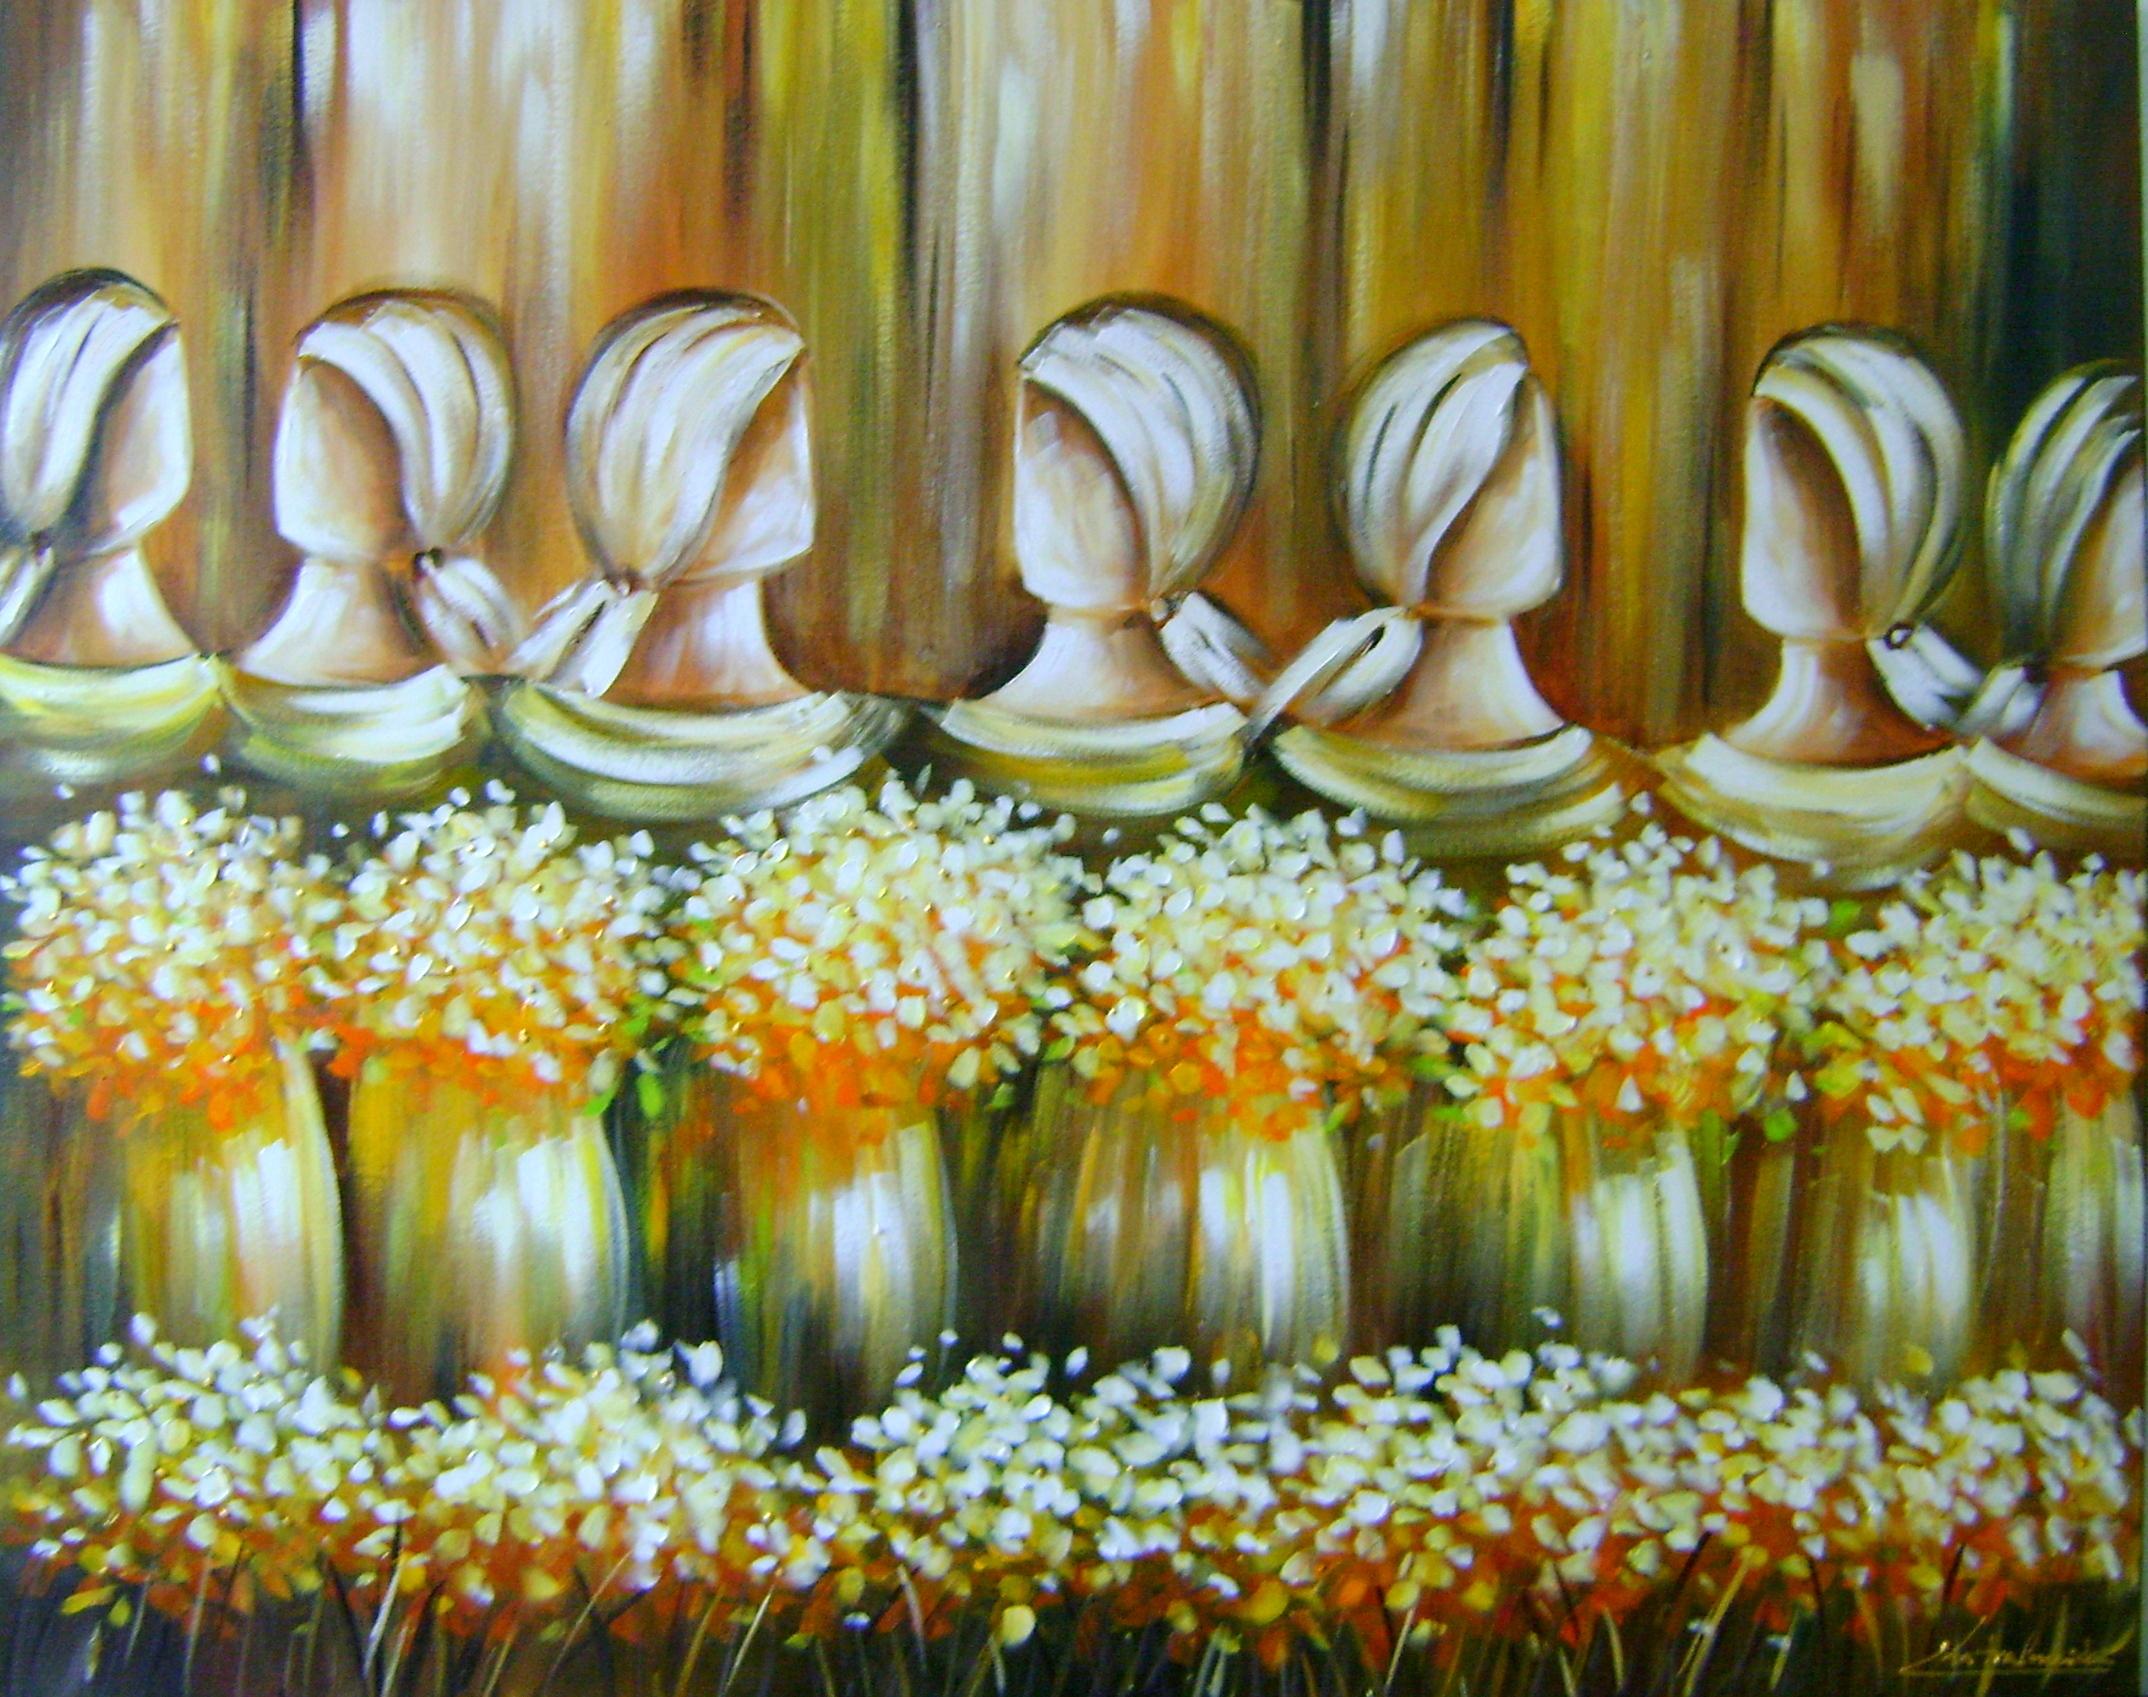 Pintura Em Tela Katia Almeida Floral Abstrato Cubista Releitura